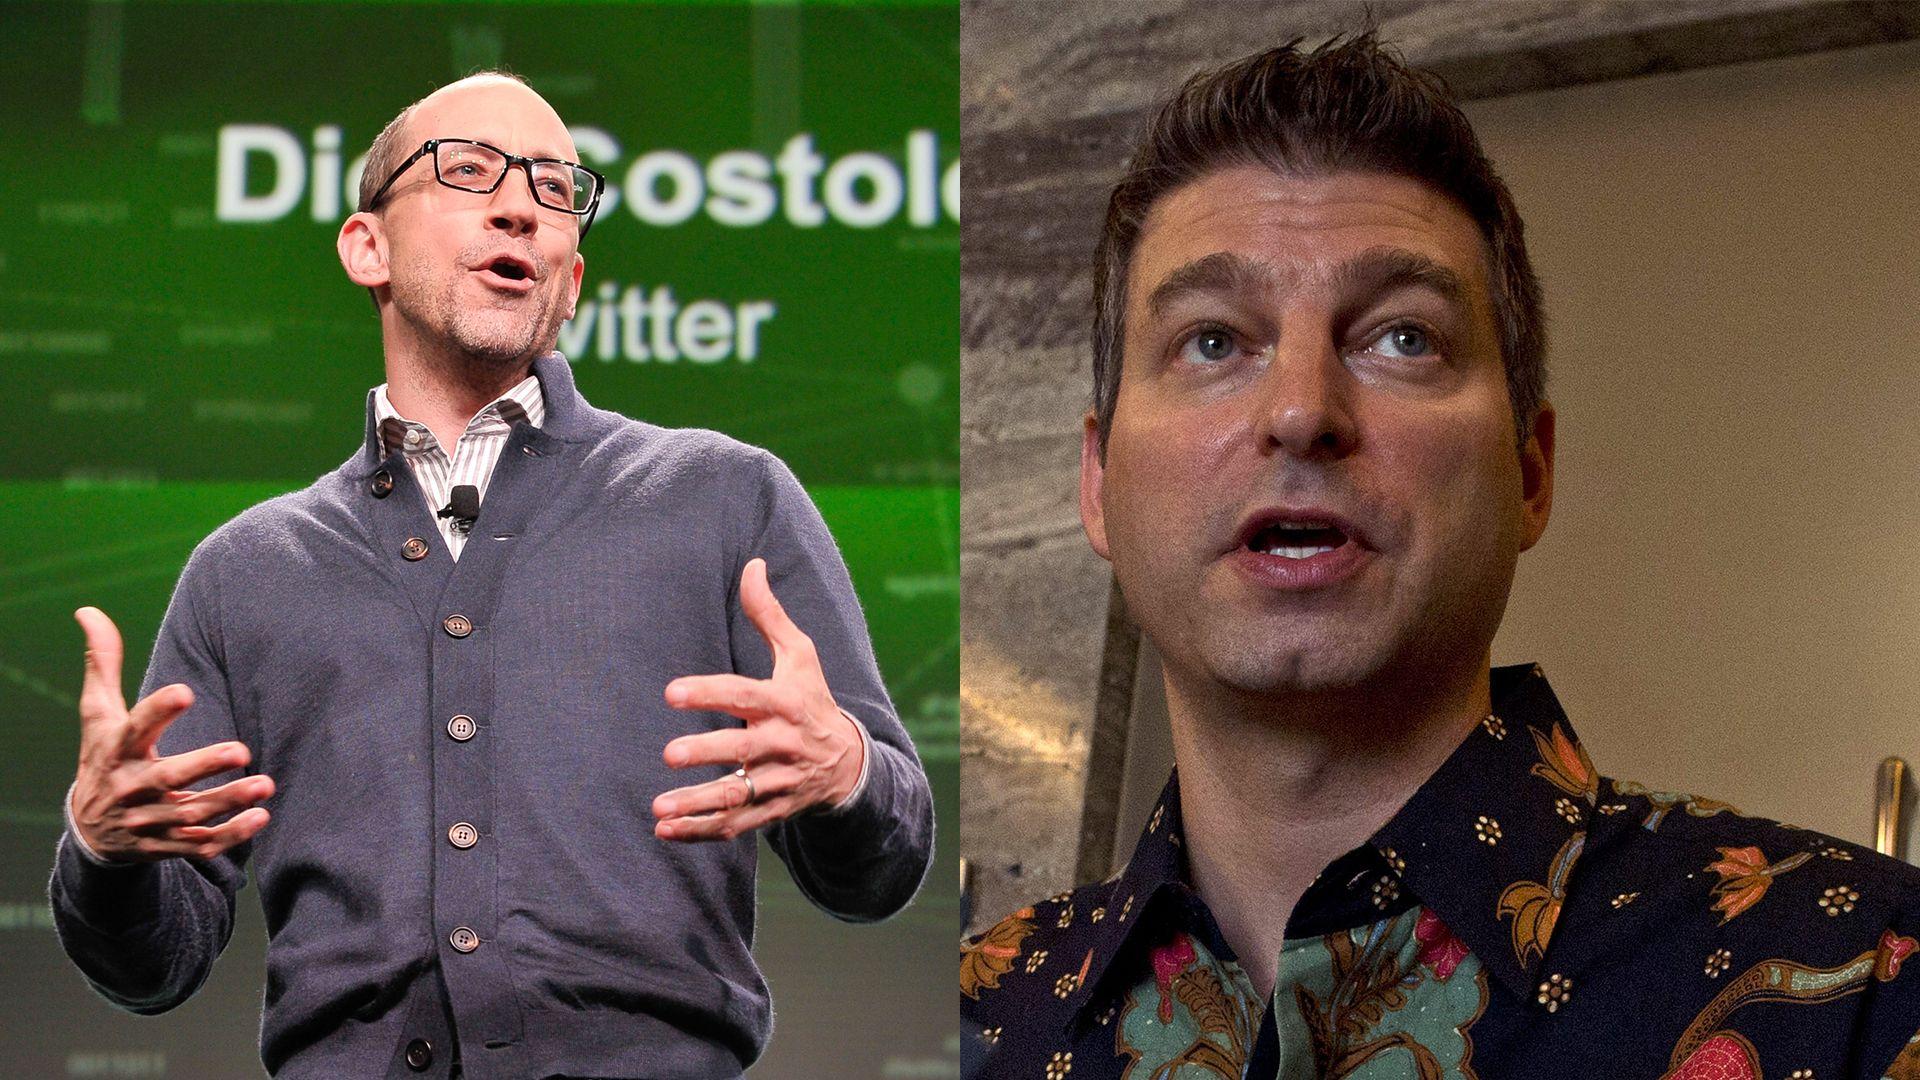 Ex-Twitter execs Dick Costolo and Adam Bain.